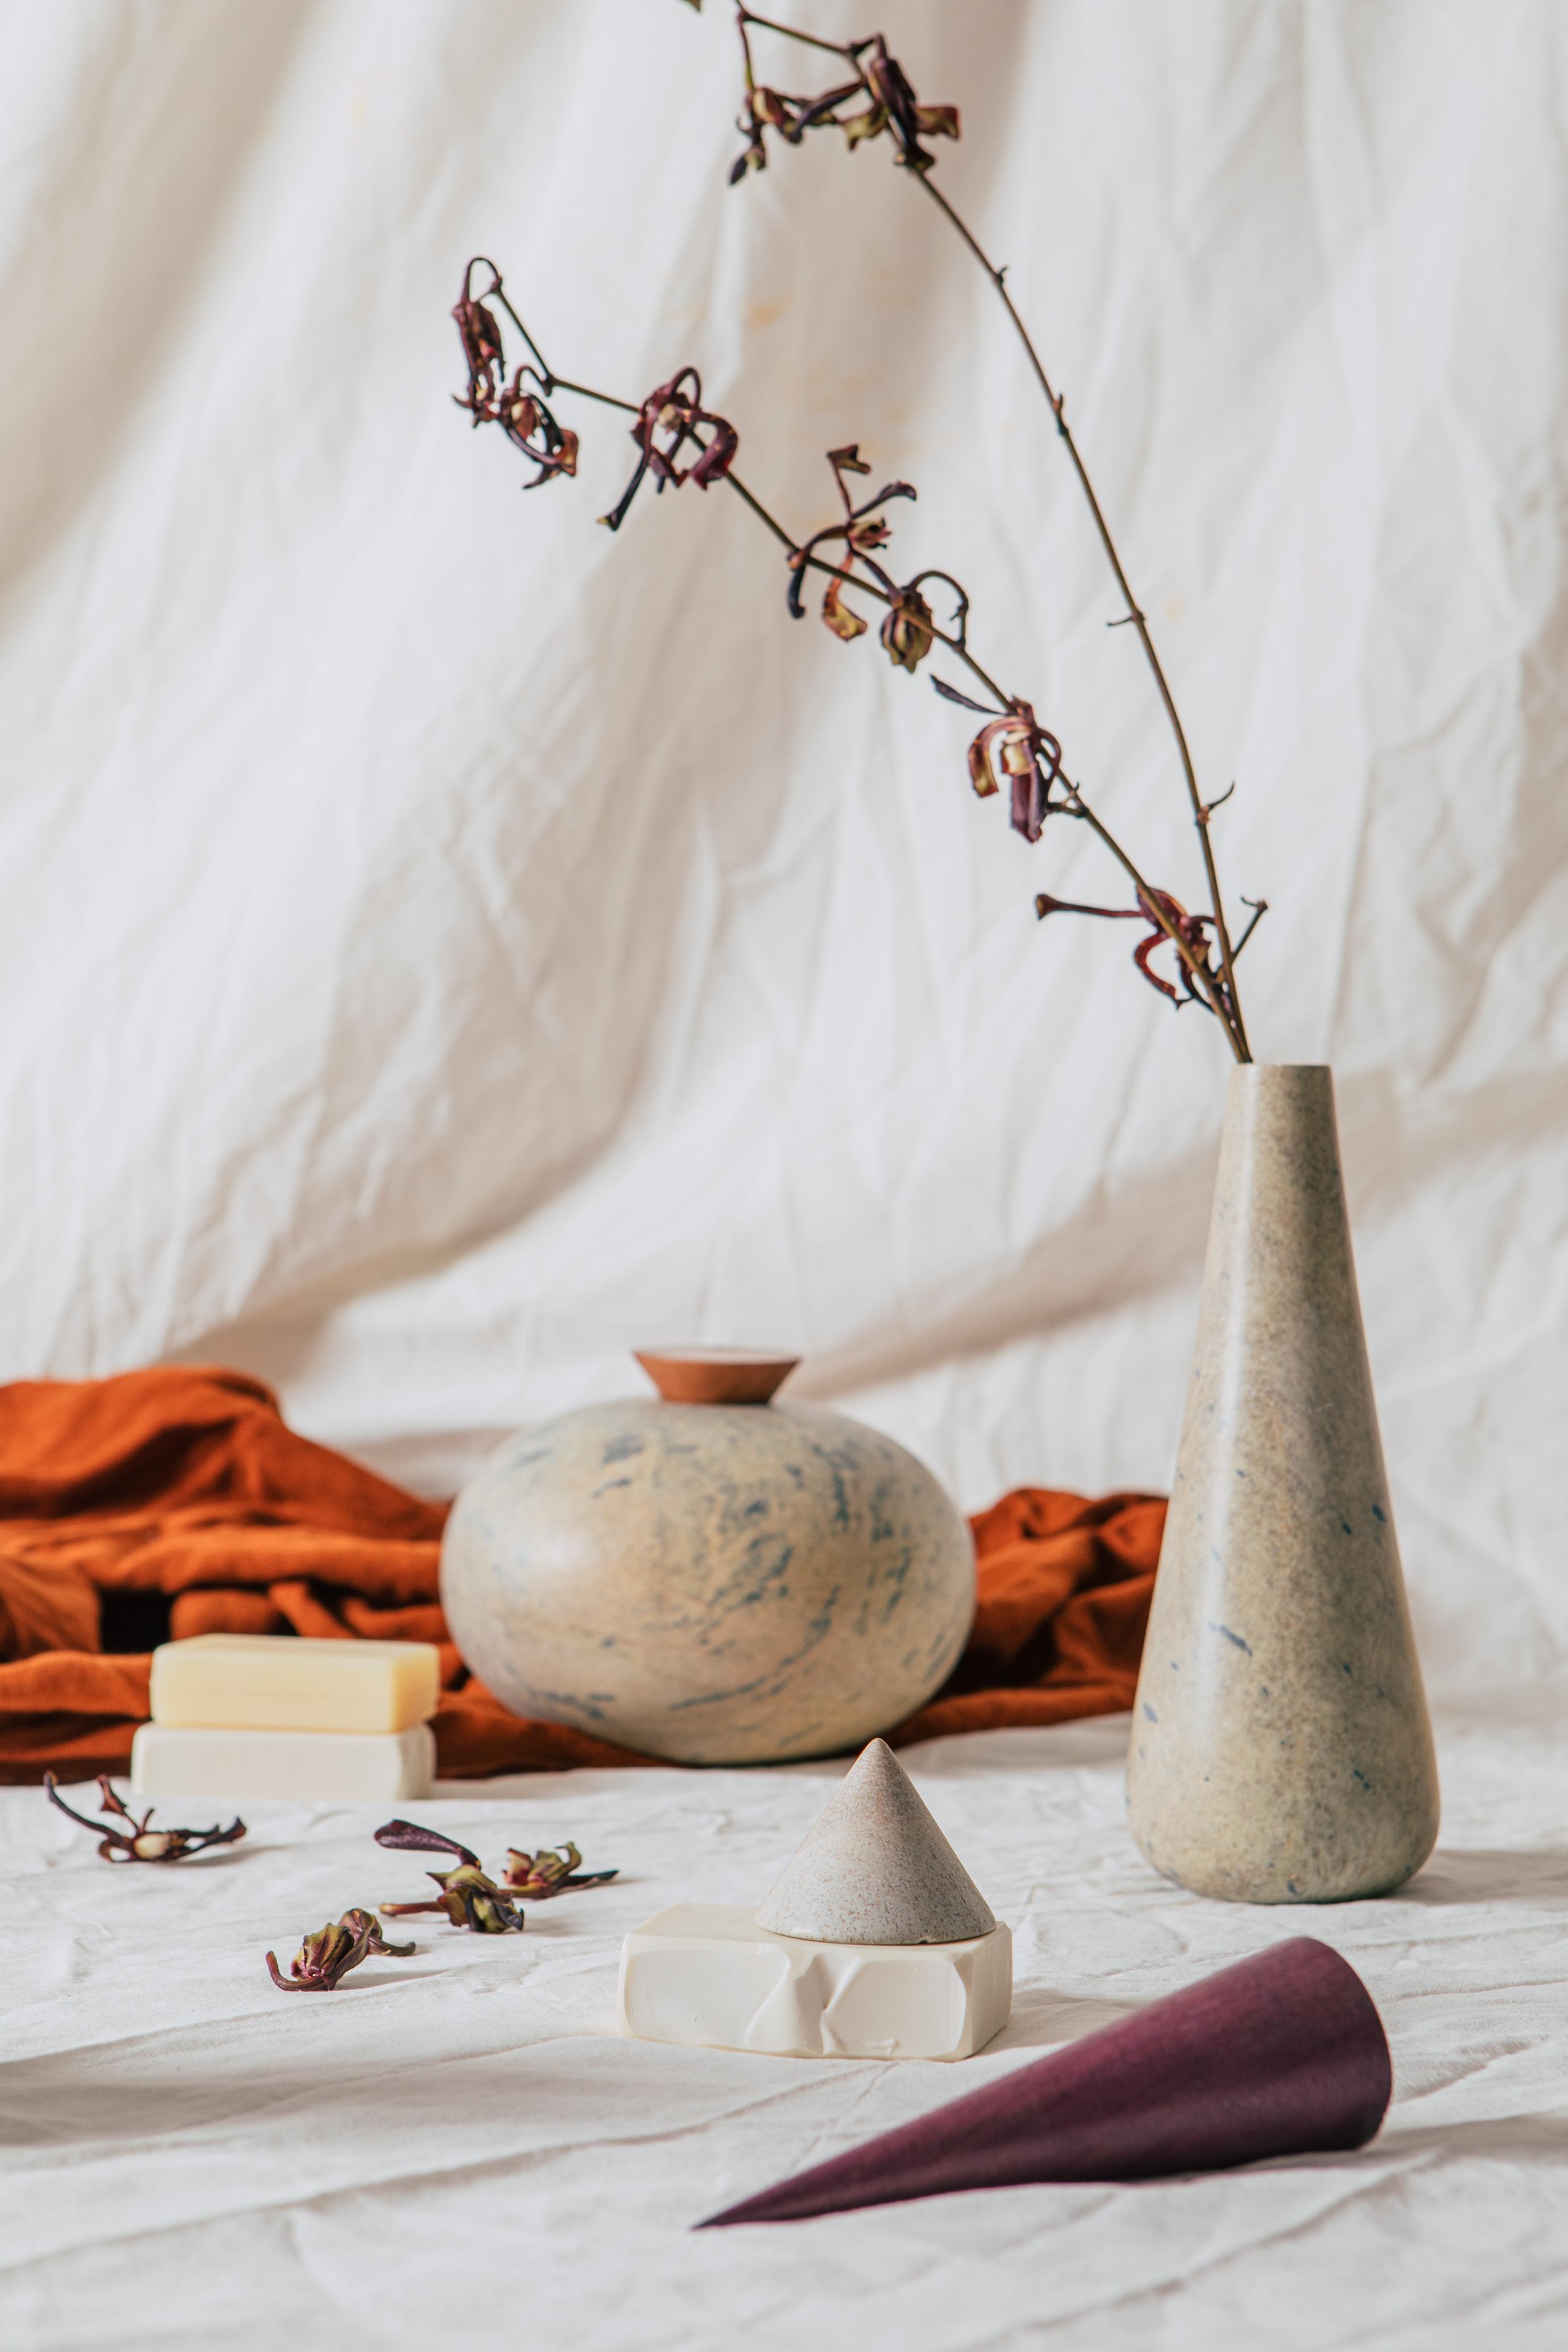 Vasos da linha Perfumaria, da mineira Alva Design (@alva_design)